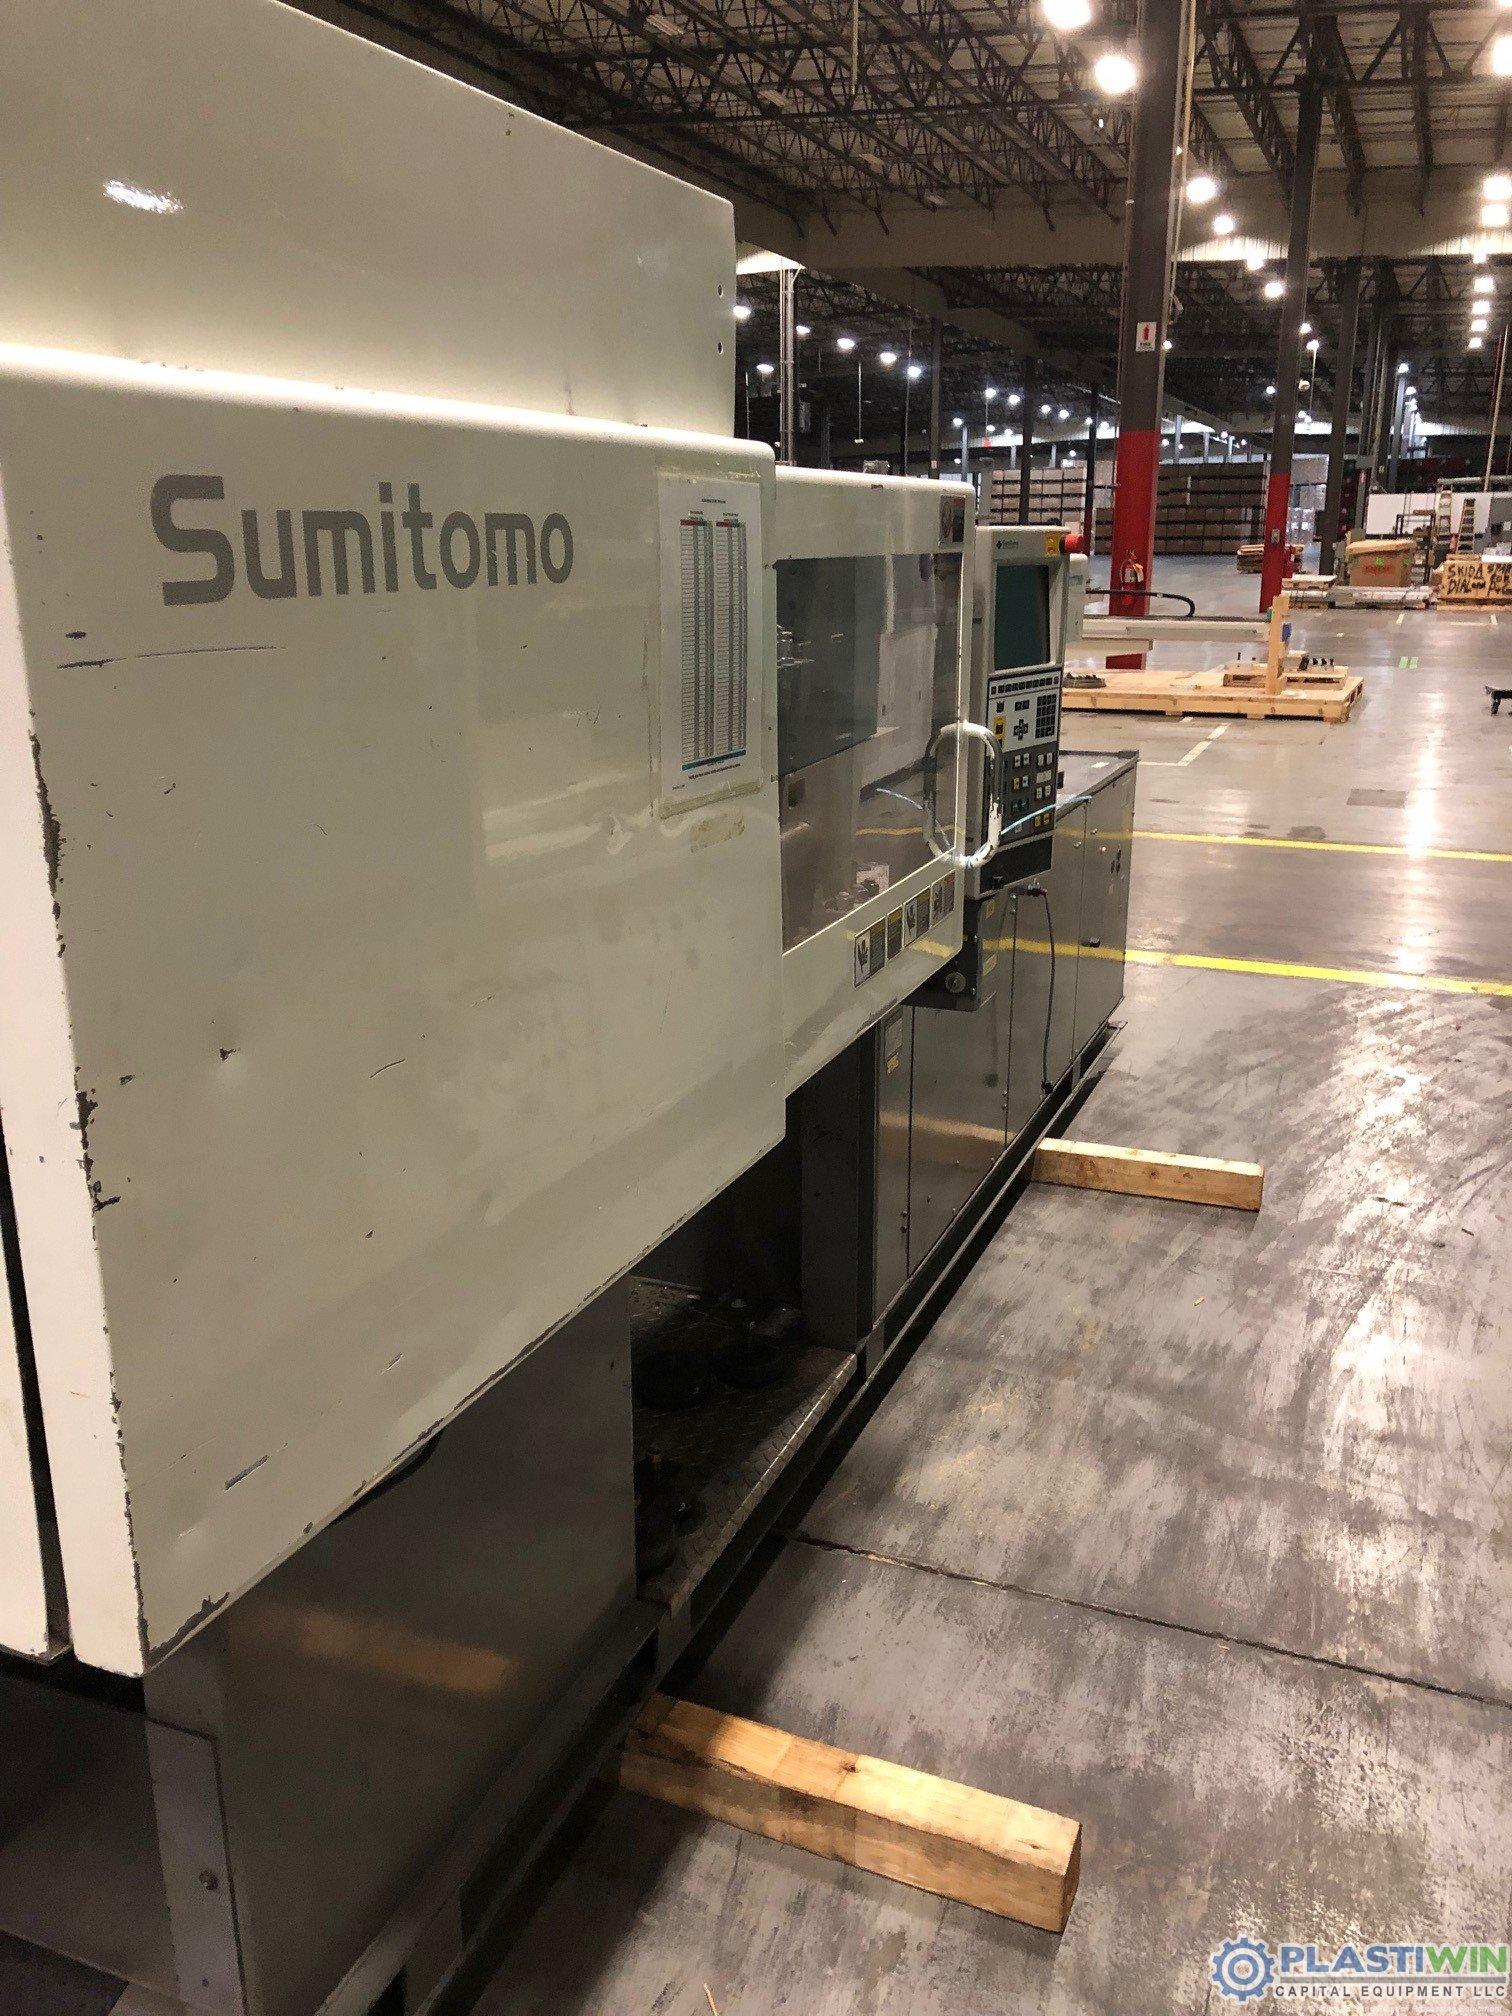 110 Ton Sumitomo SH100C